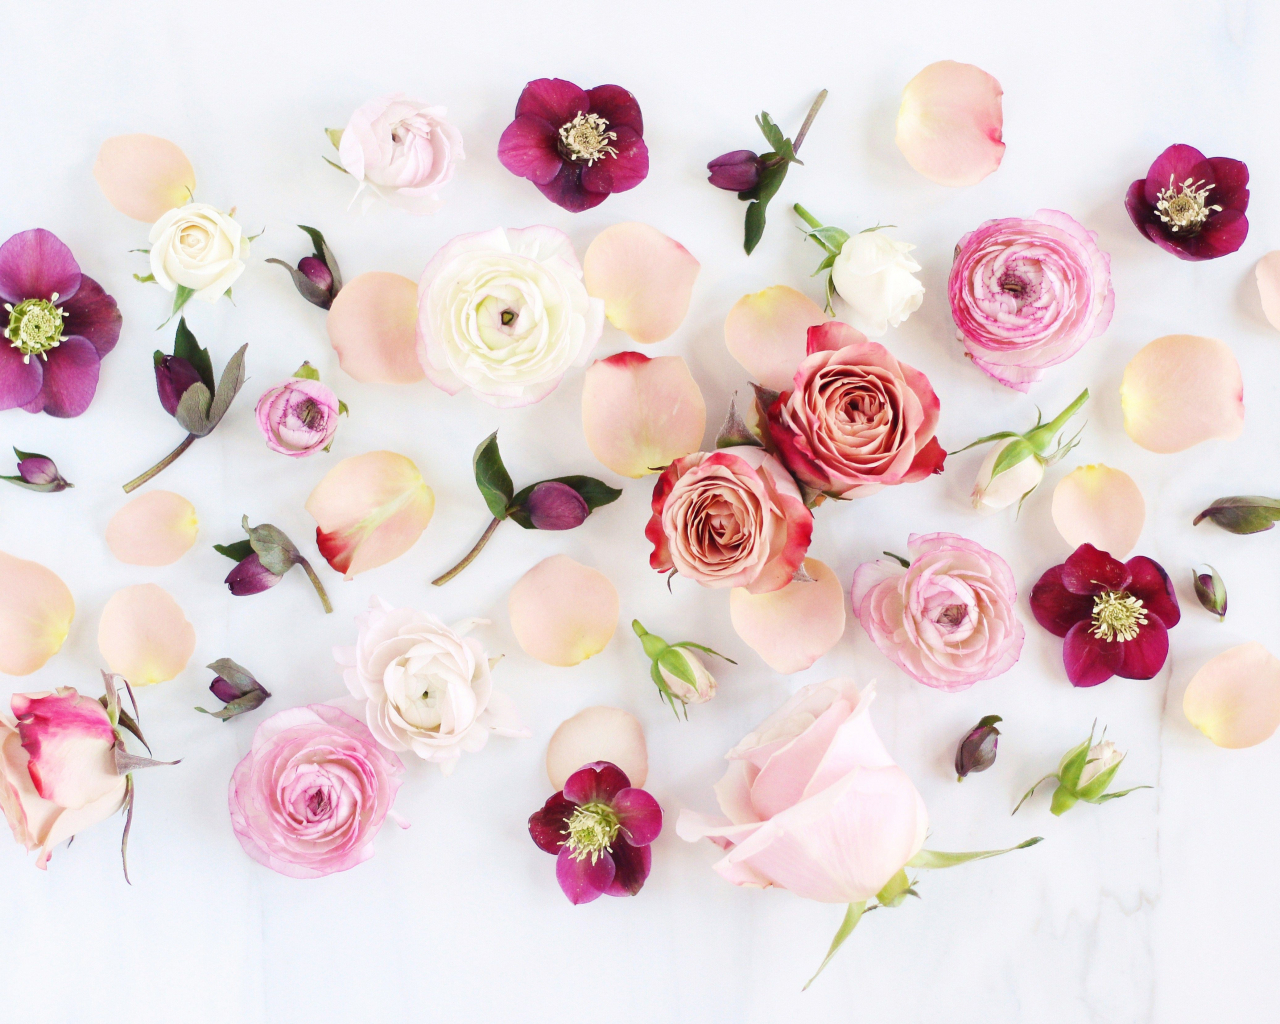 Aesthetic Hd Iphone Wallpapers Flowers In 2020 Spring Desktop Wallpaper Flower Aesthetic Vintage Flowers Wallpaper